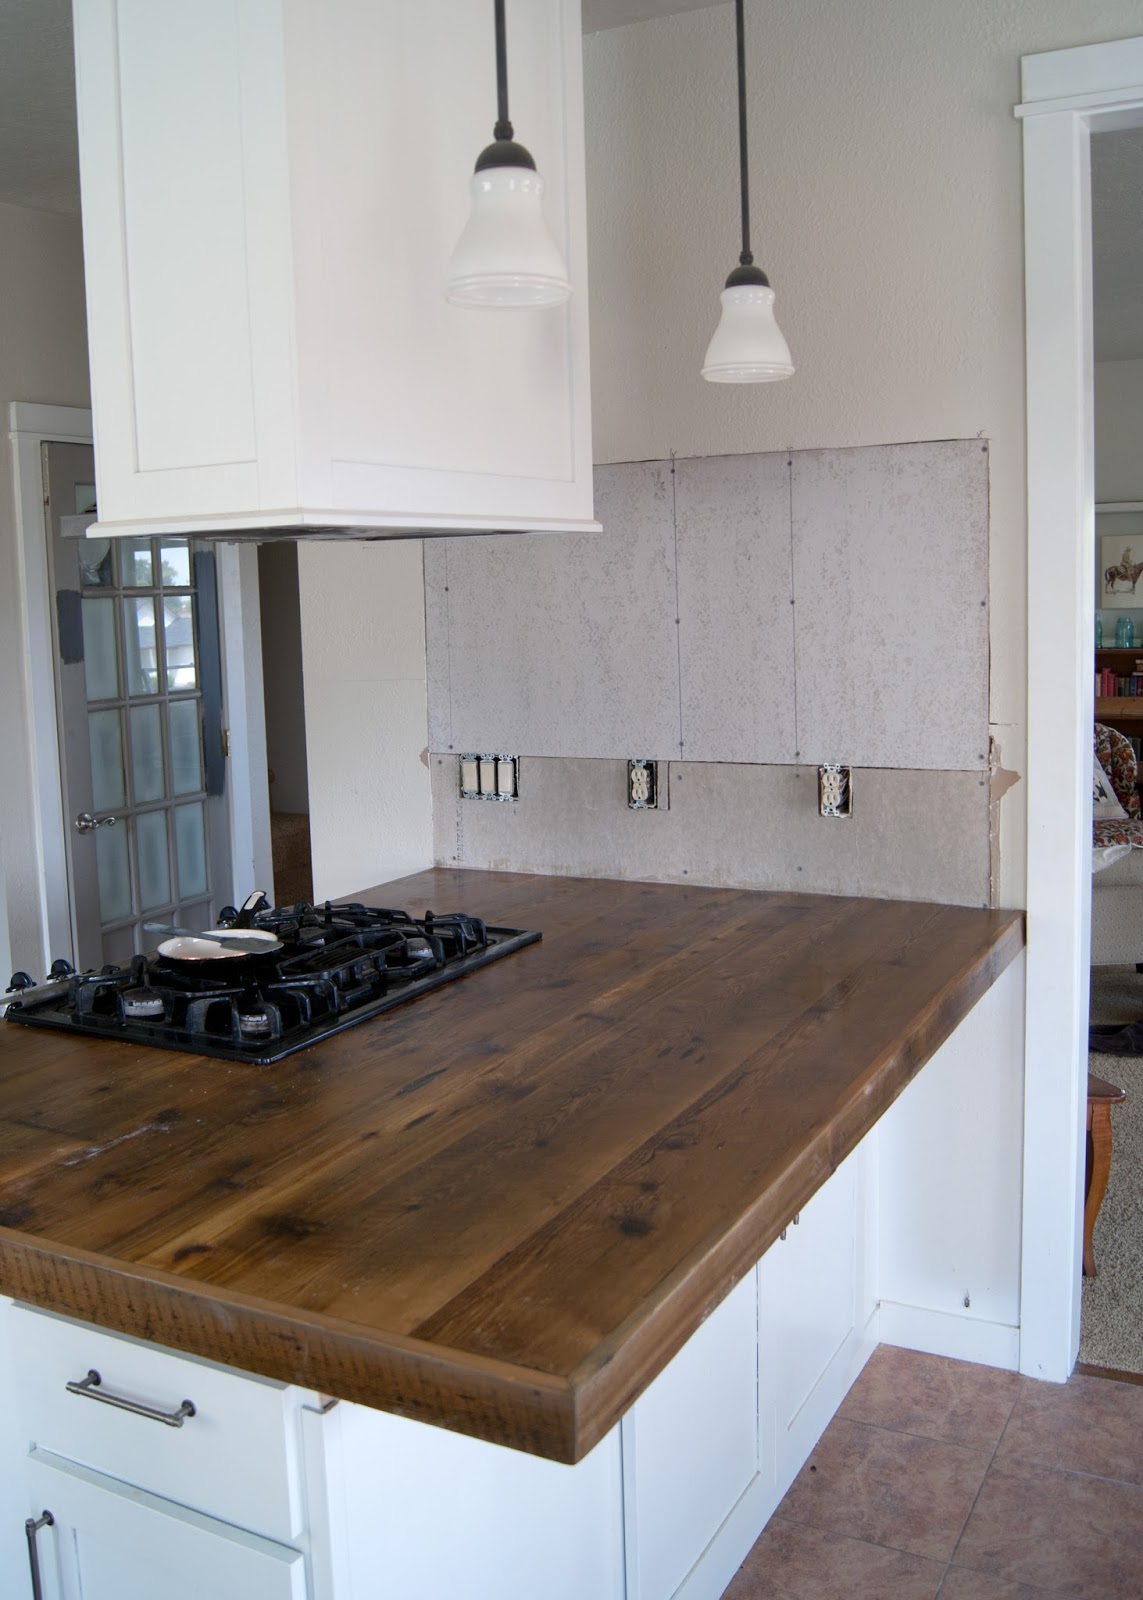 diy reclaimed wood countertop   averie lane: diy reclaimed wood